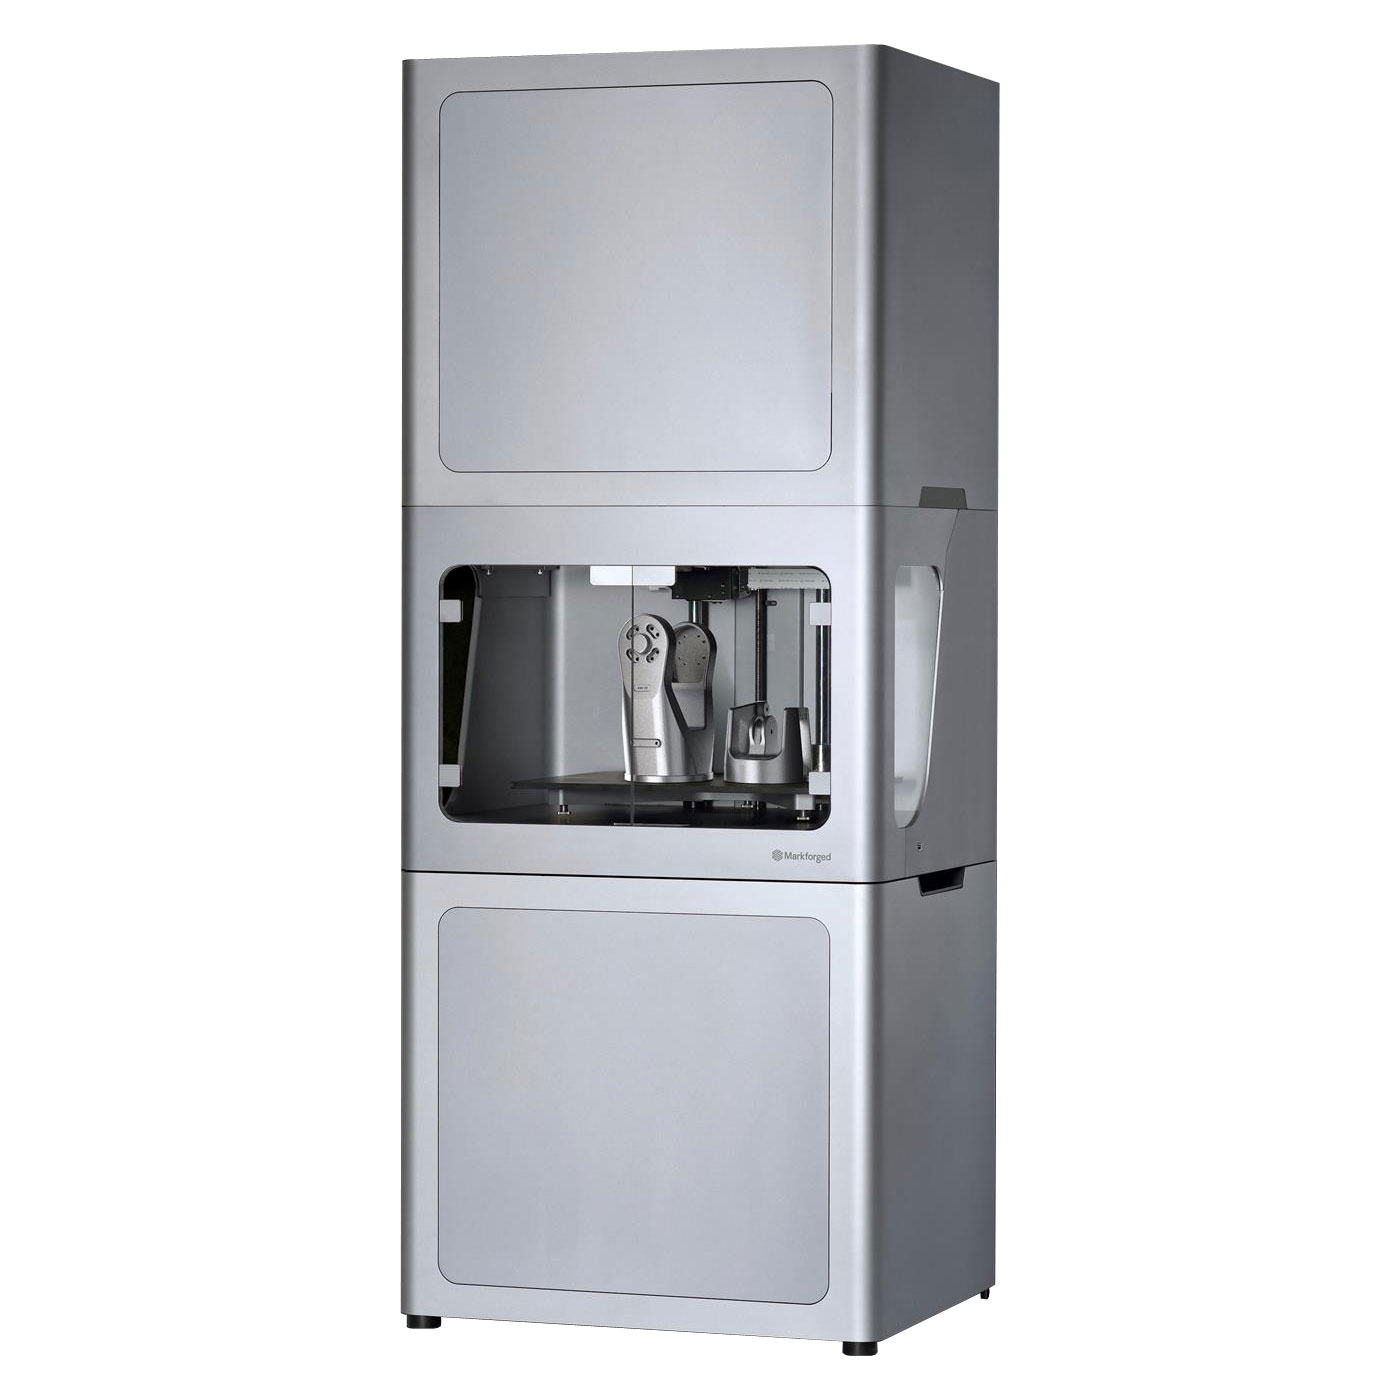 Markforged Metal X 3D printer. Image via Markforged.